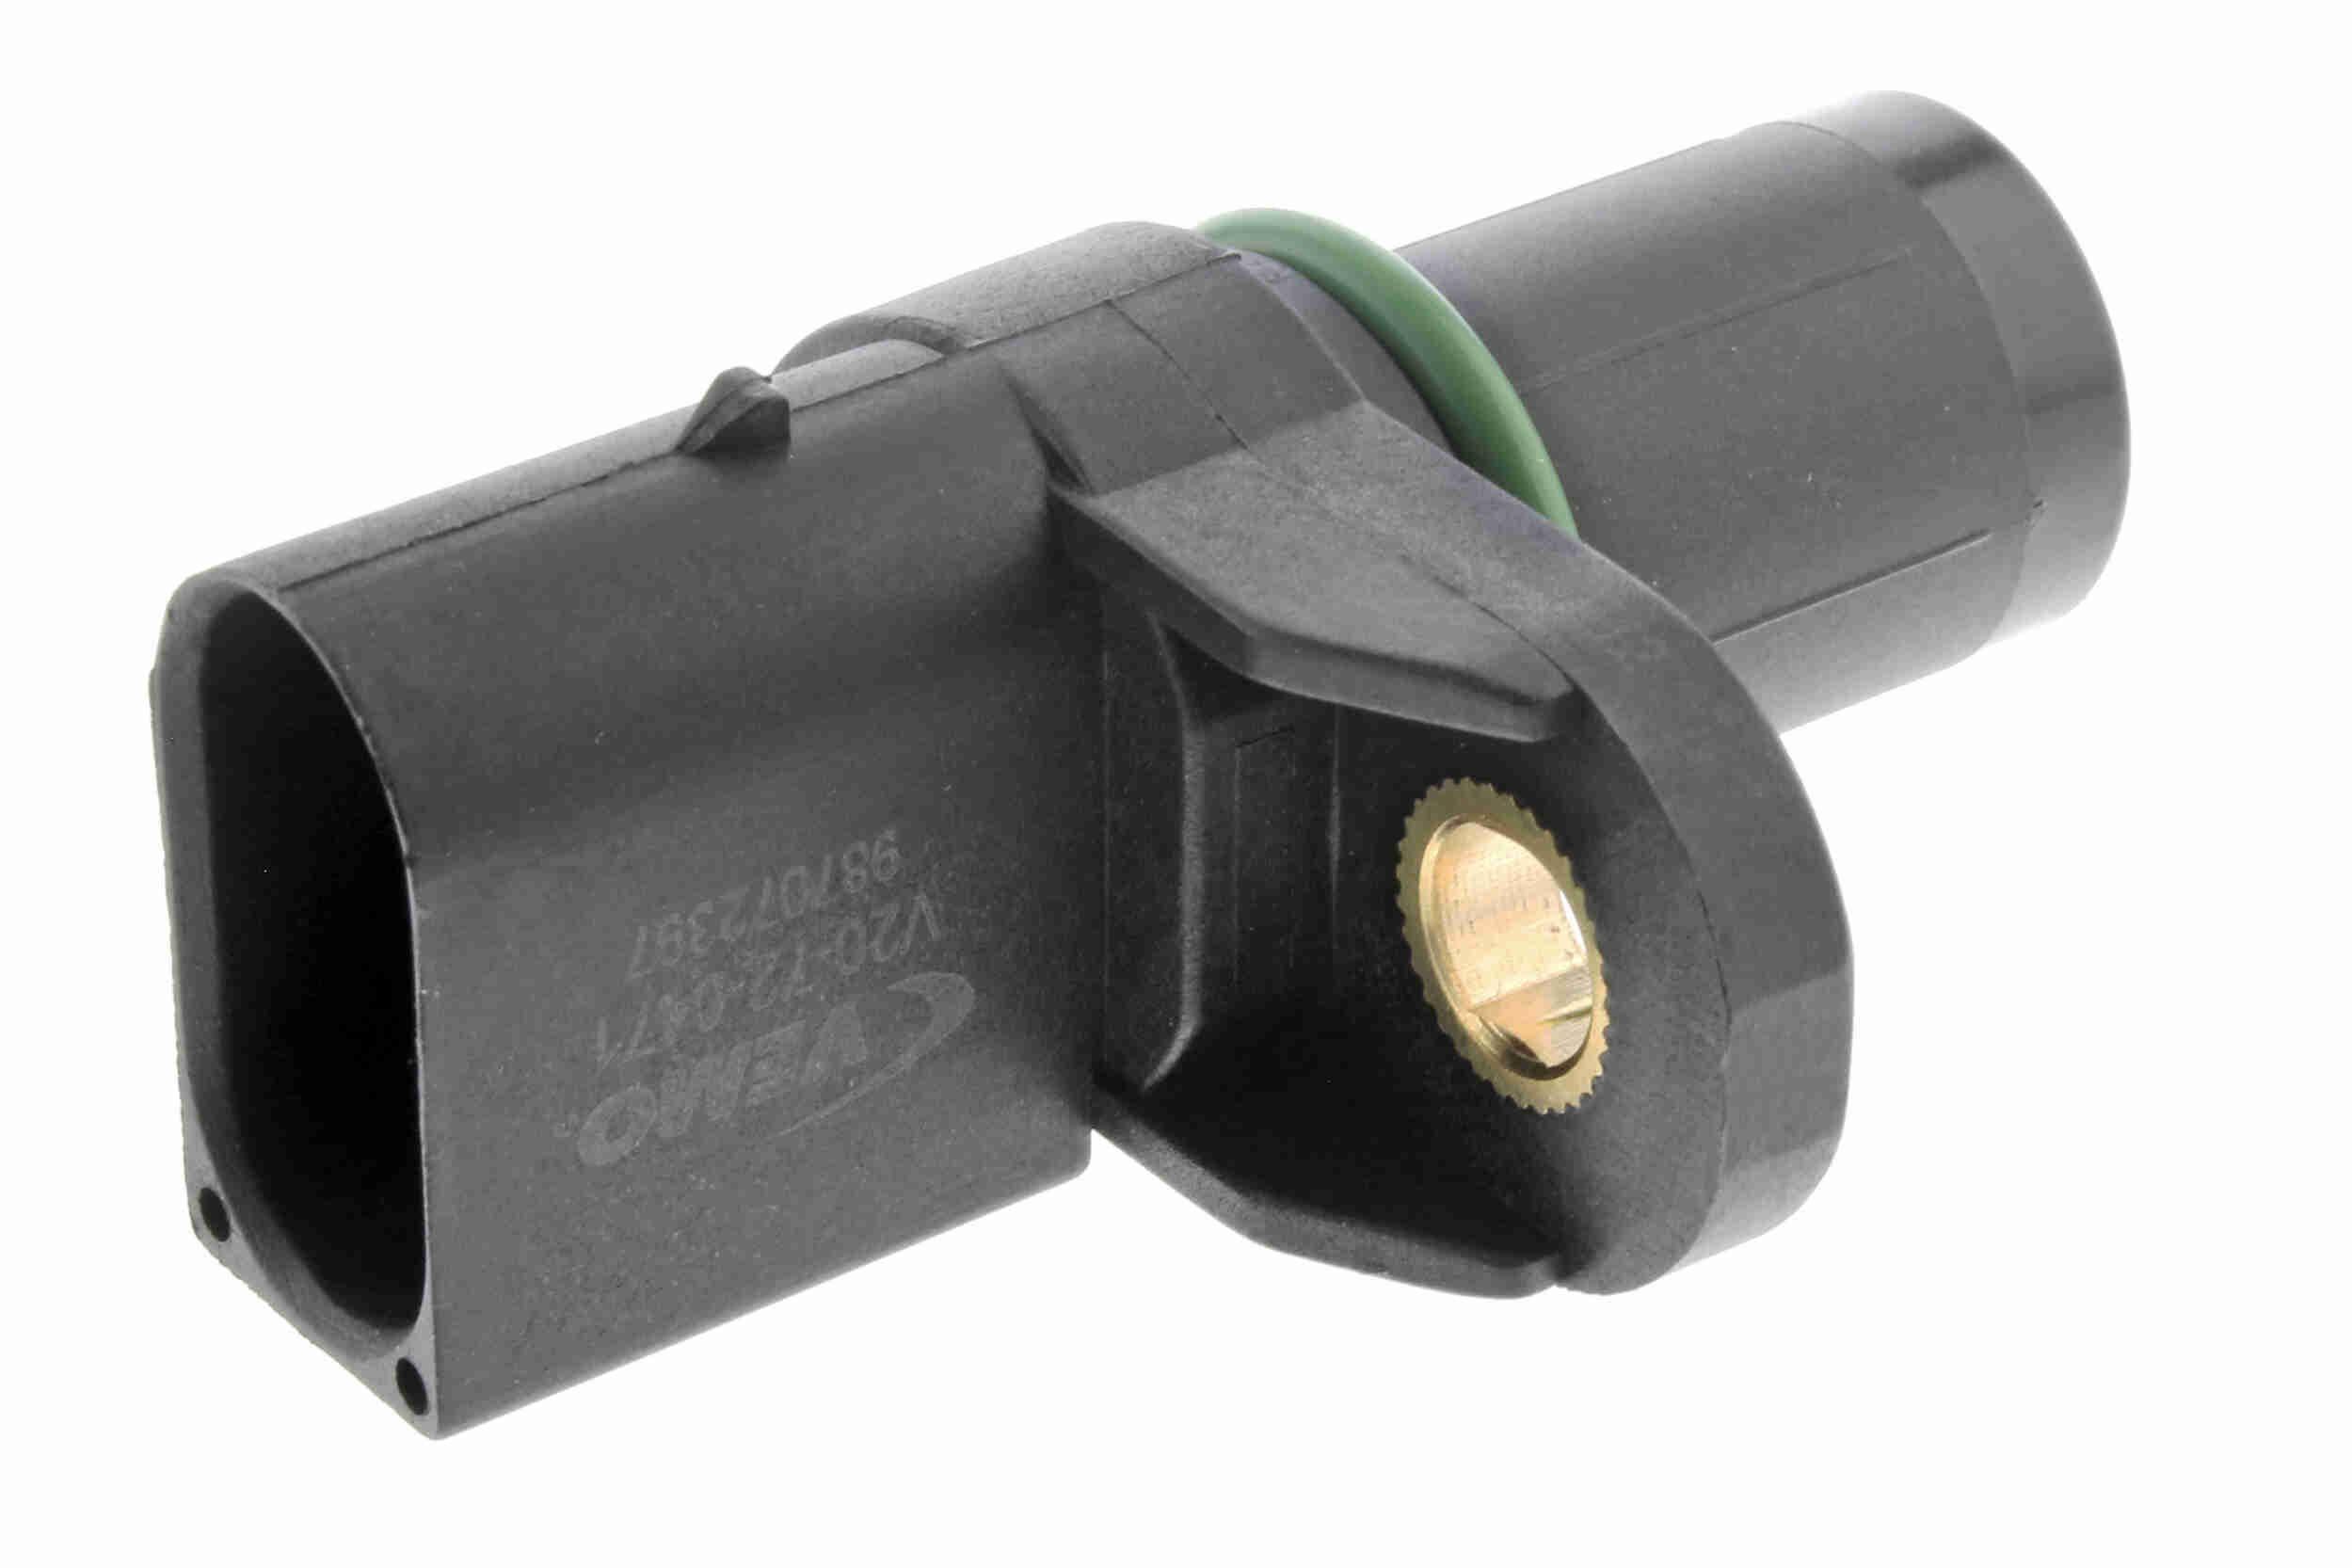 Nockenwellensensor V20-72-0471 VEMO V20-72-0471 in Original Qualität